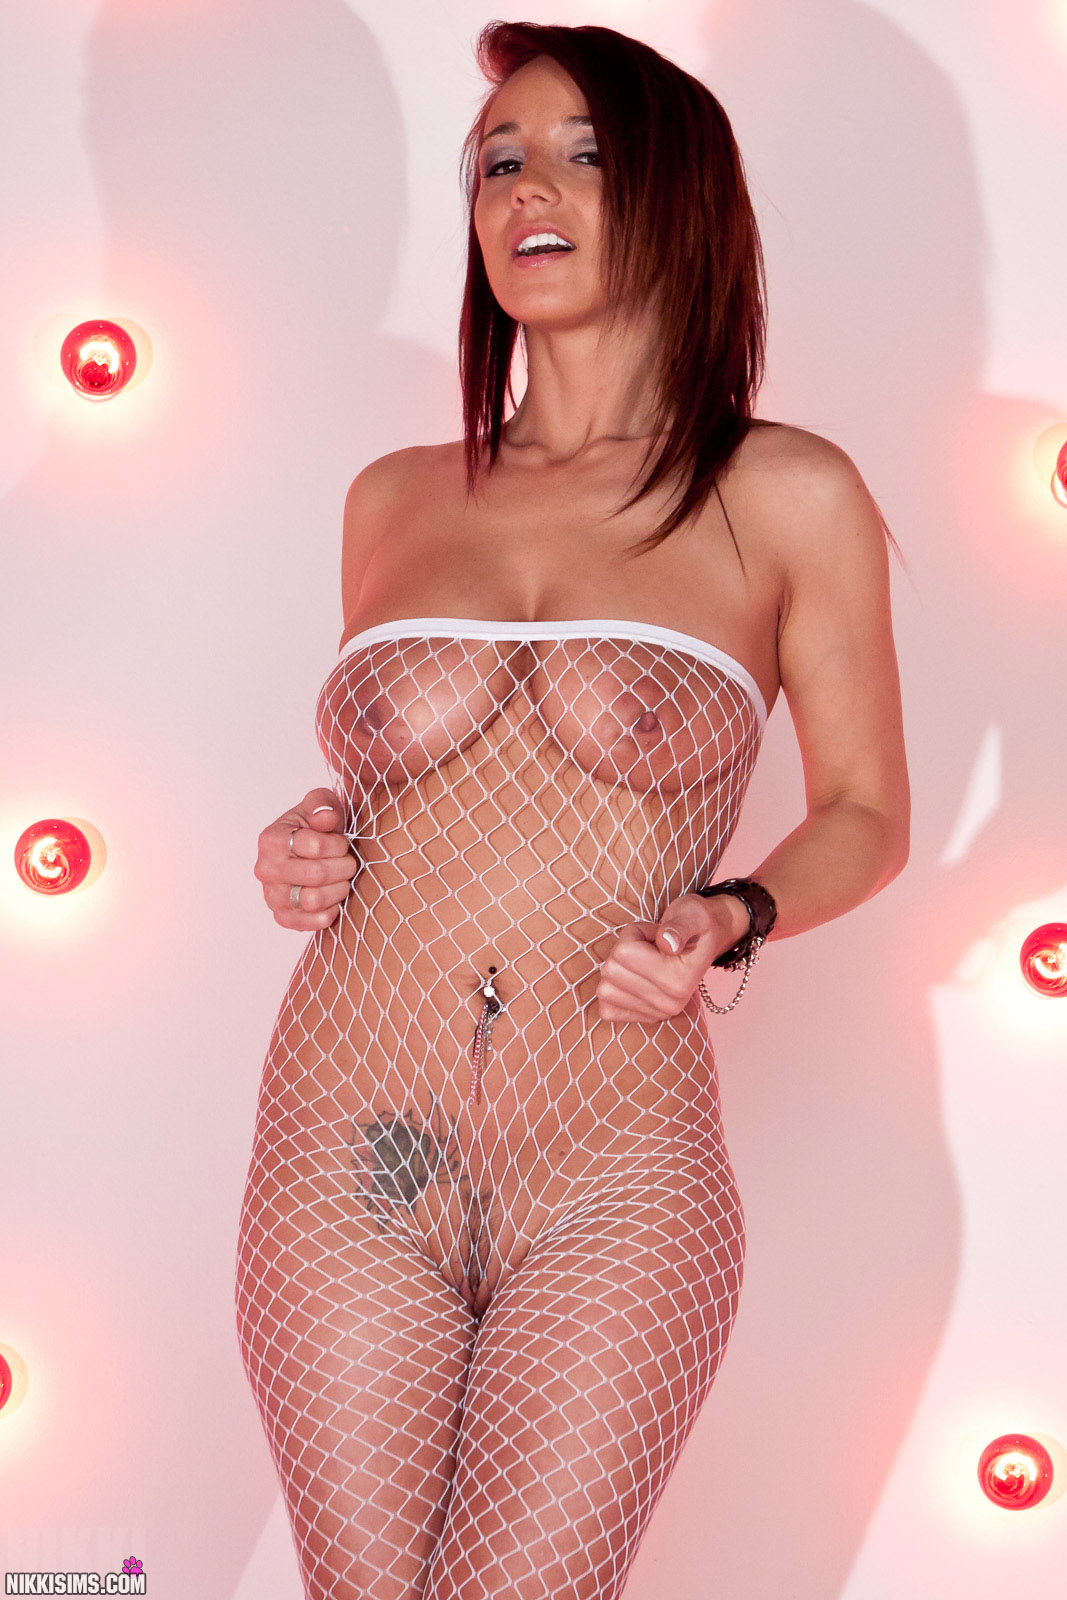 bad girl nude pic